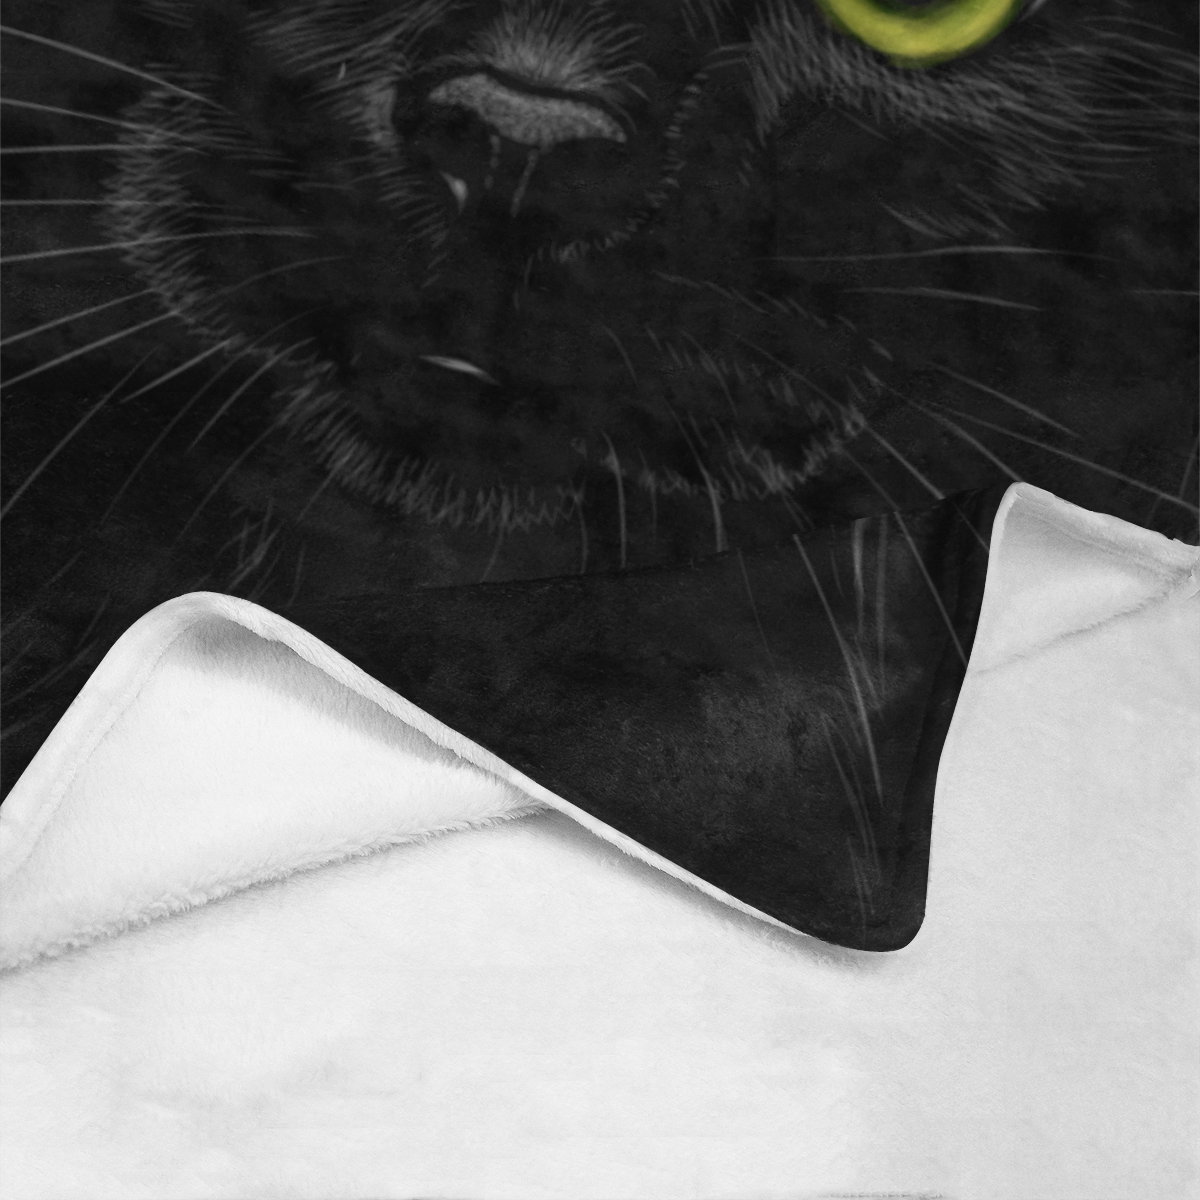 Black Cat Ultra-Soft Micro Fleece Blanket 54''x70''